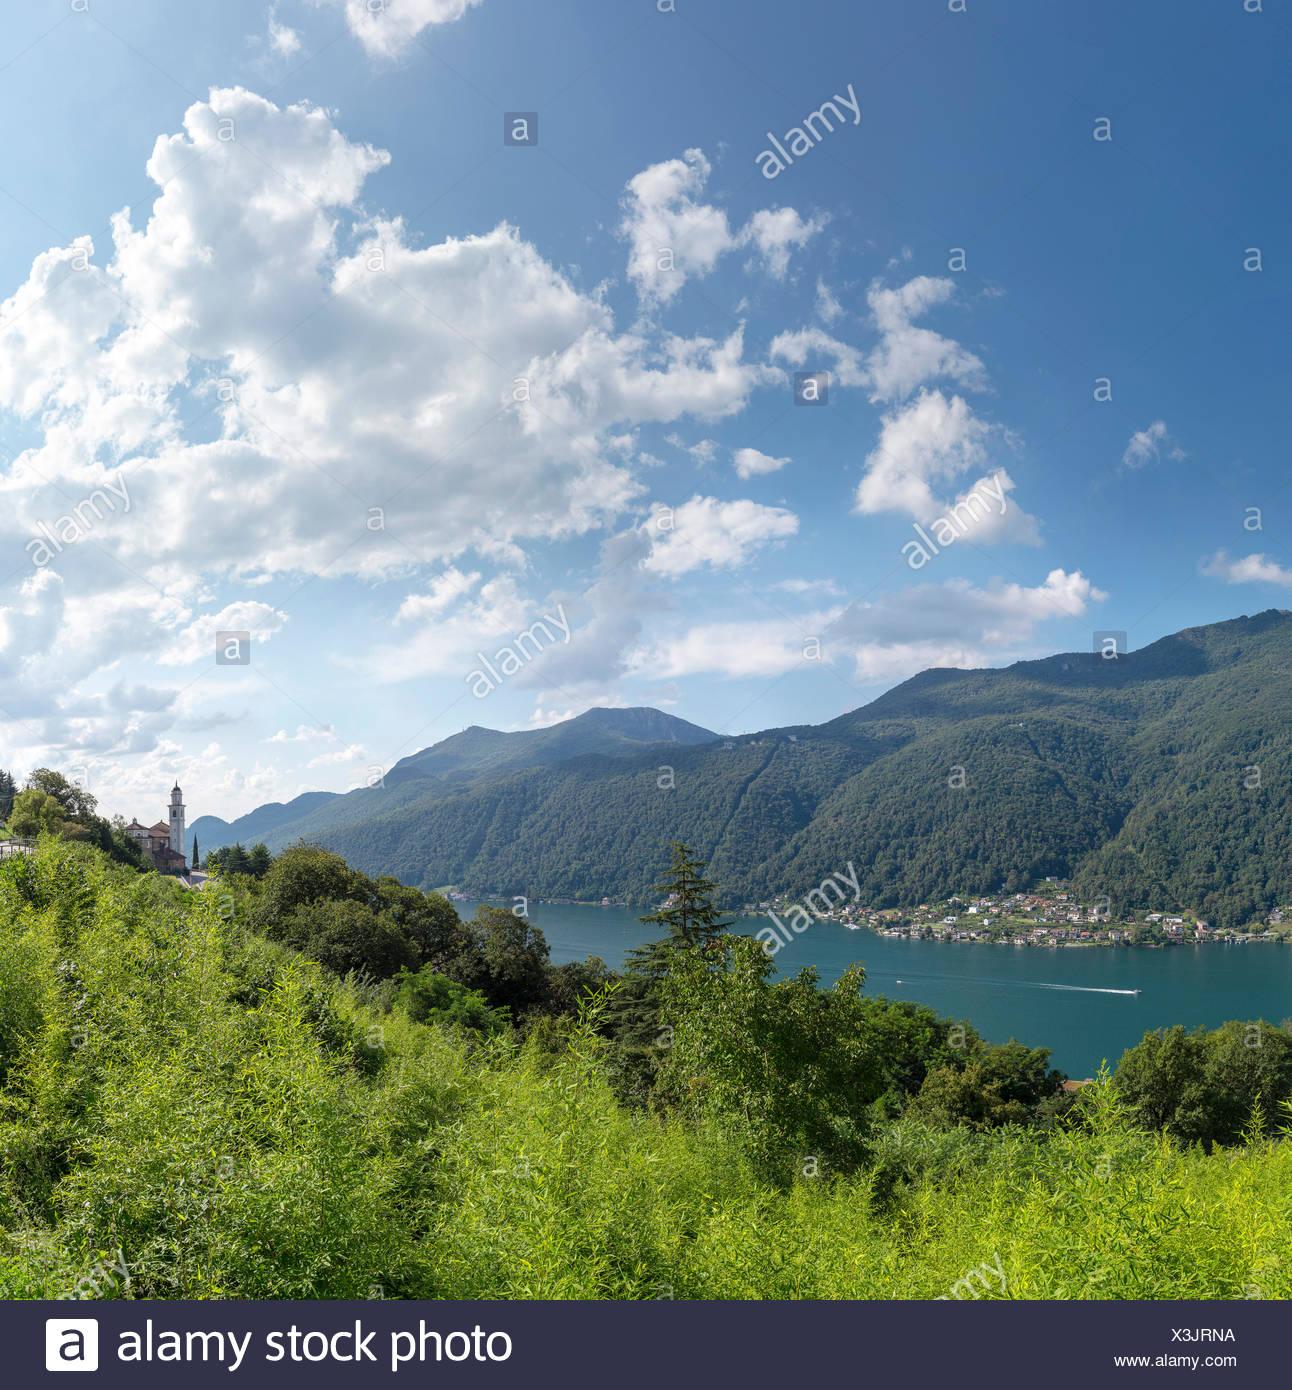 Switzerland, Europe, Vico Morcote, Ticino, banks, Lake Lugano, landscape, water, trees, summer, mountains, lake, clouds, - Stock Image